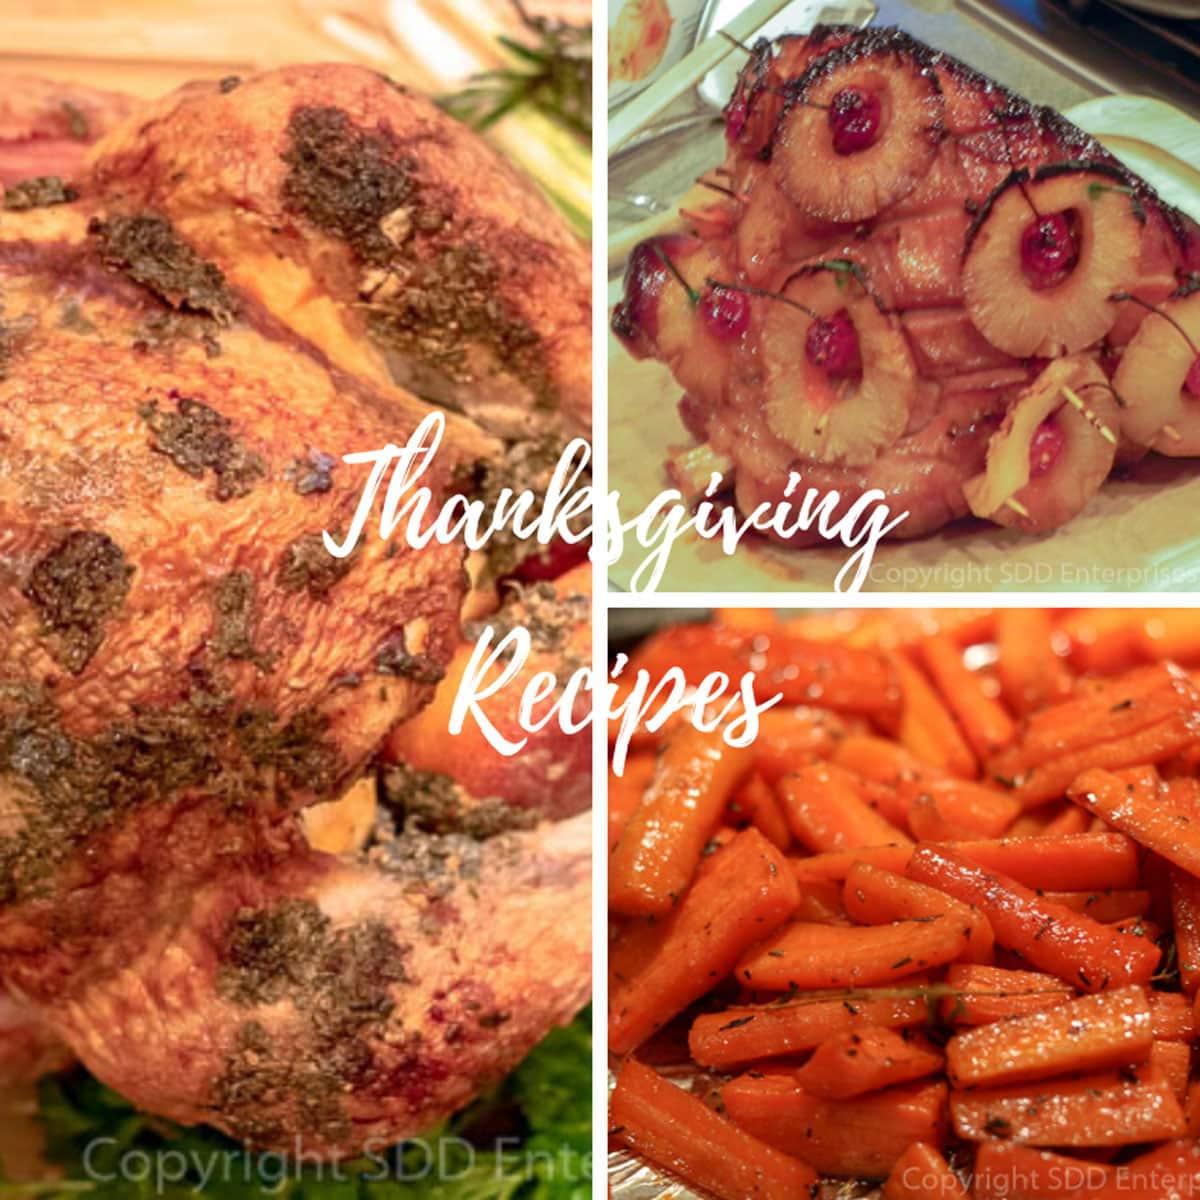 Roast turkey image, ham image, barrots image with graphics